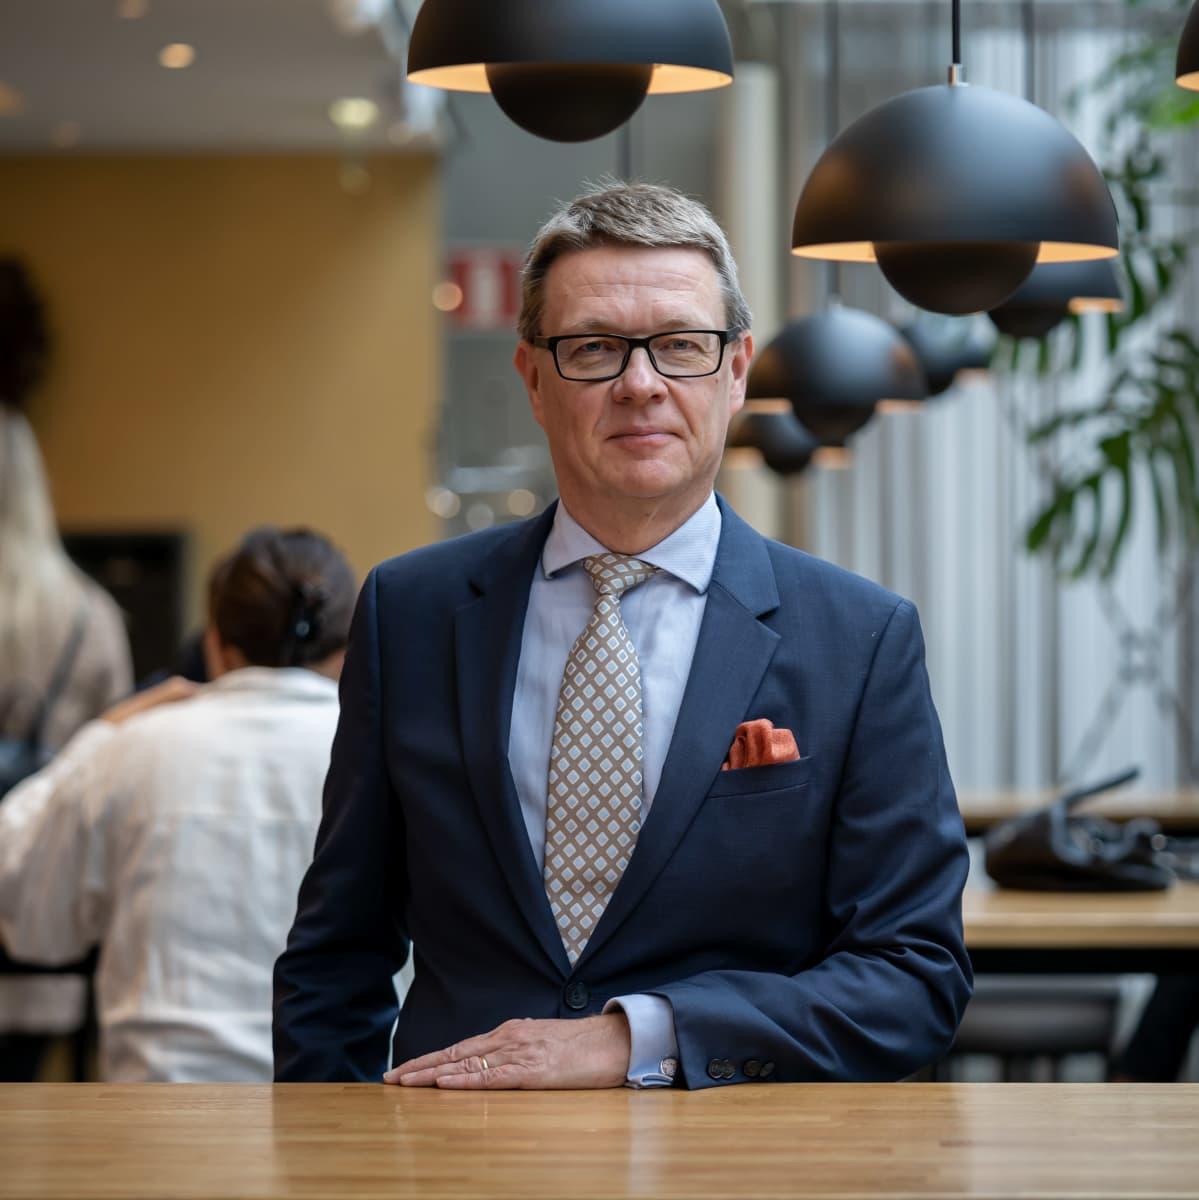 Matkailu- ja Ravintolapalvelut MaRa ry:n toimitusjohtaja Timo Lappi